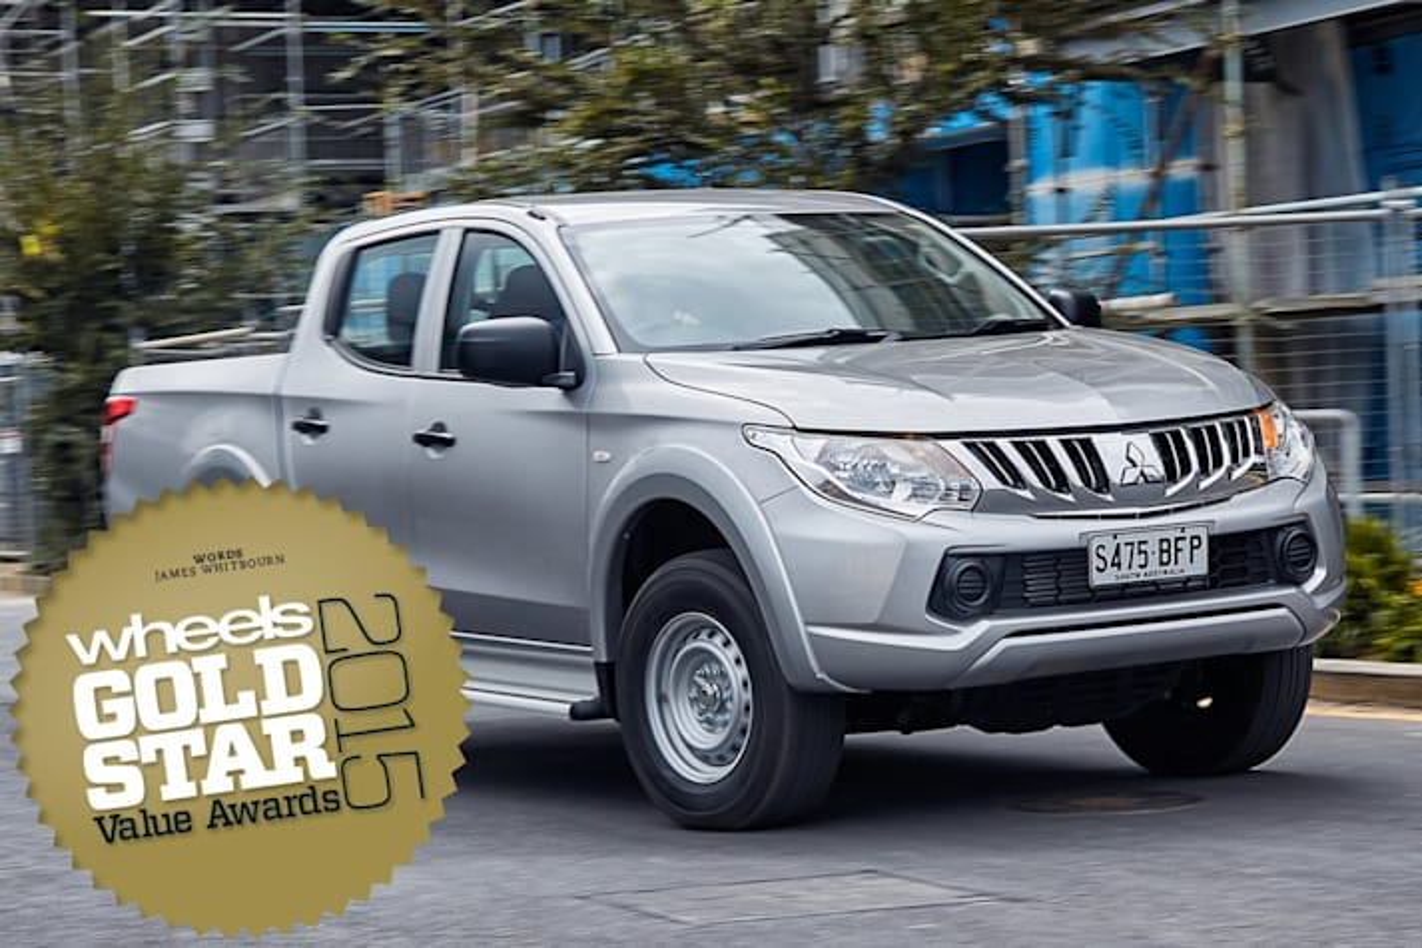 Dual-cab 4x4 utes: Gold Star Value Awards 2015